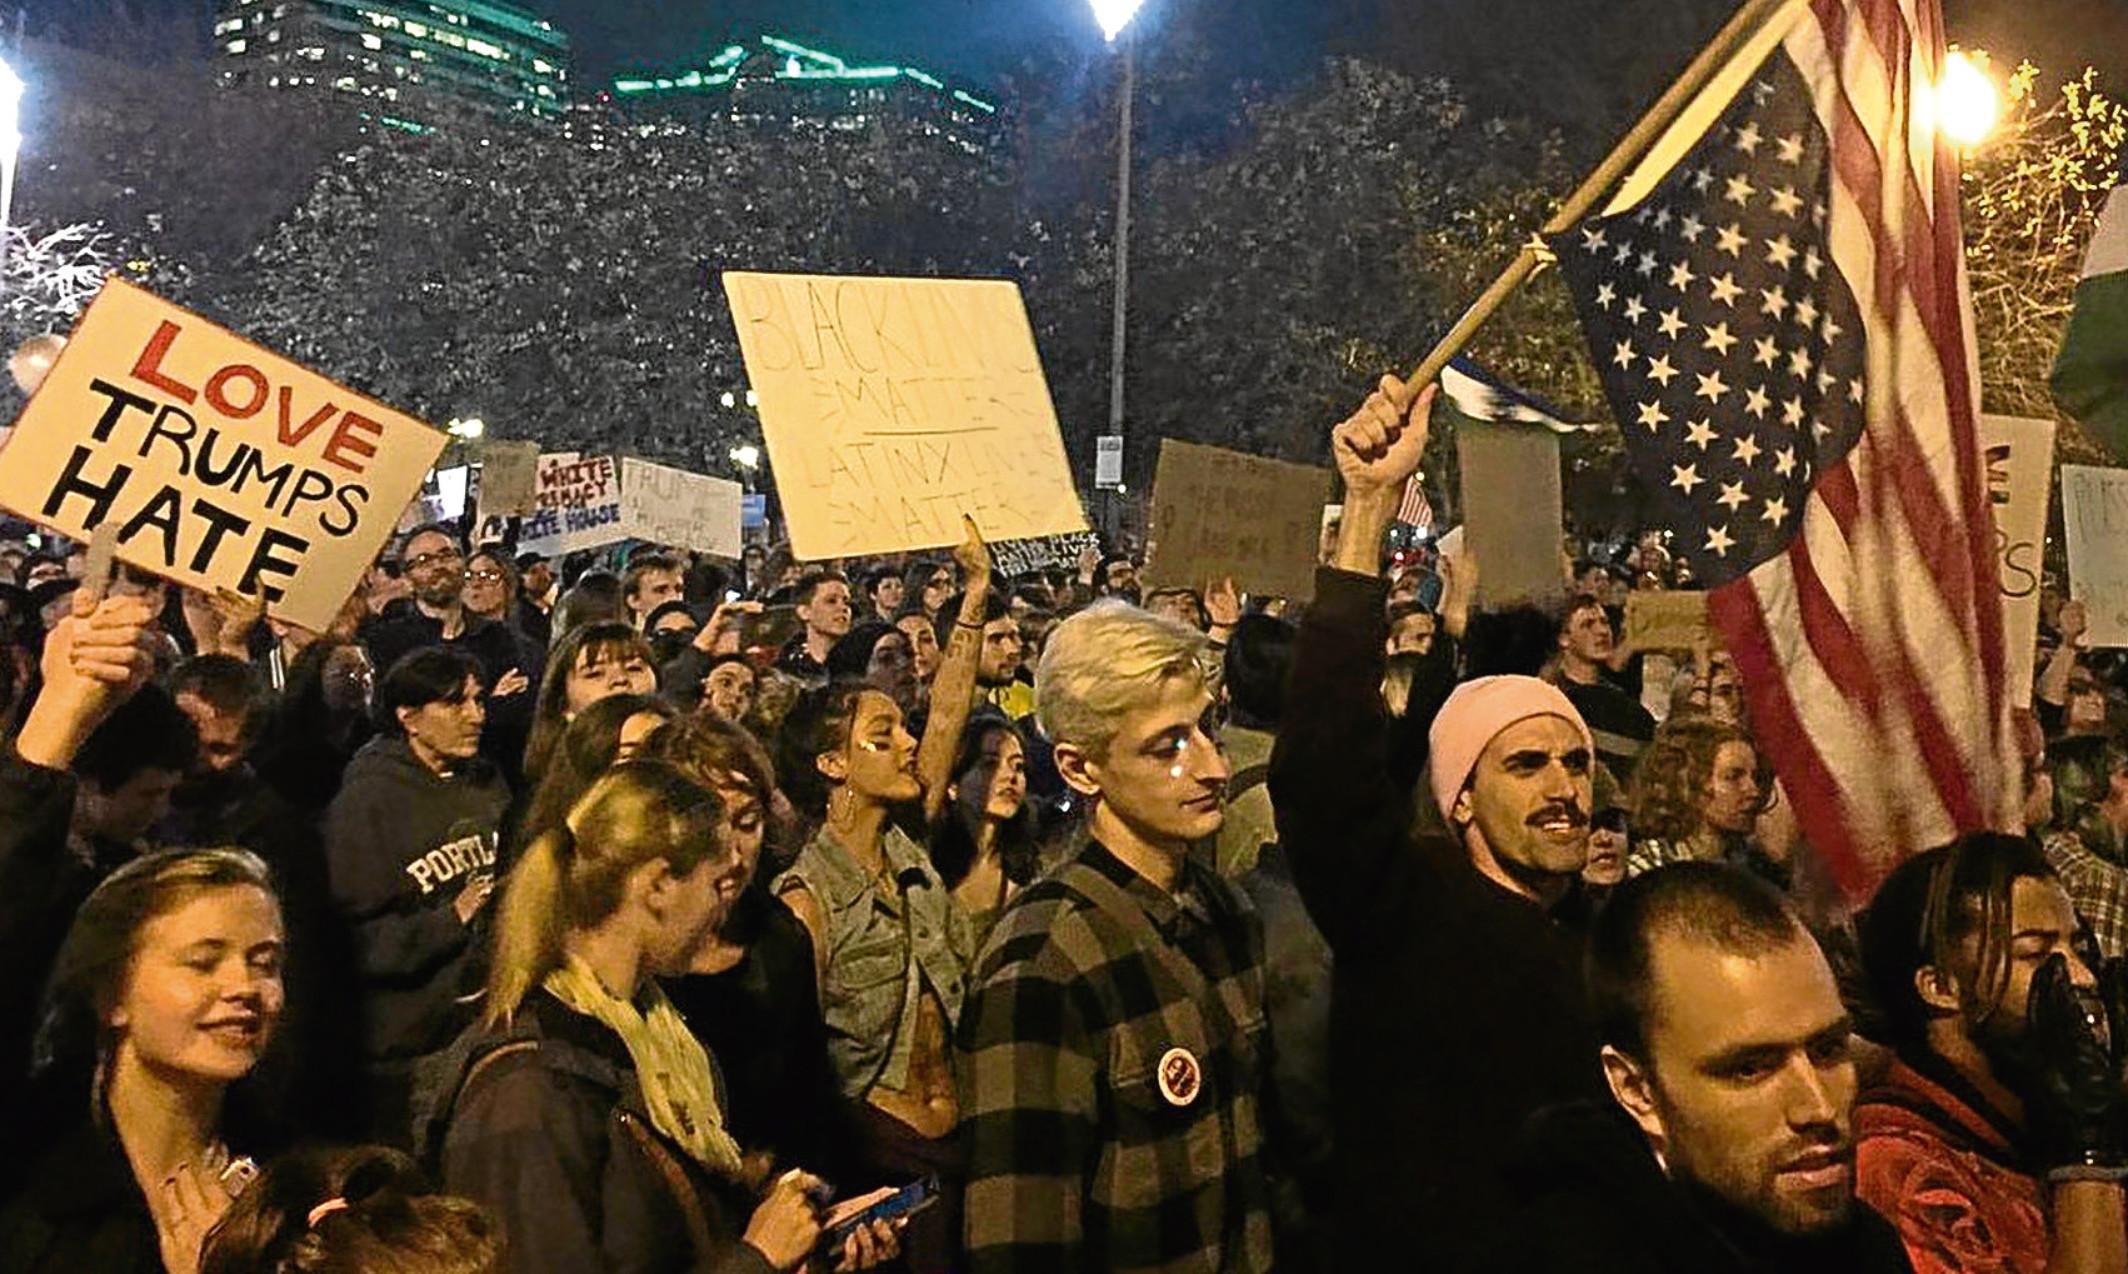 Anti-Trump protesters take to the streets of Portland, Oregon.